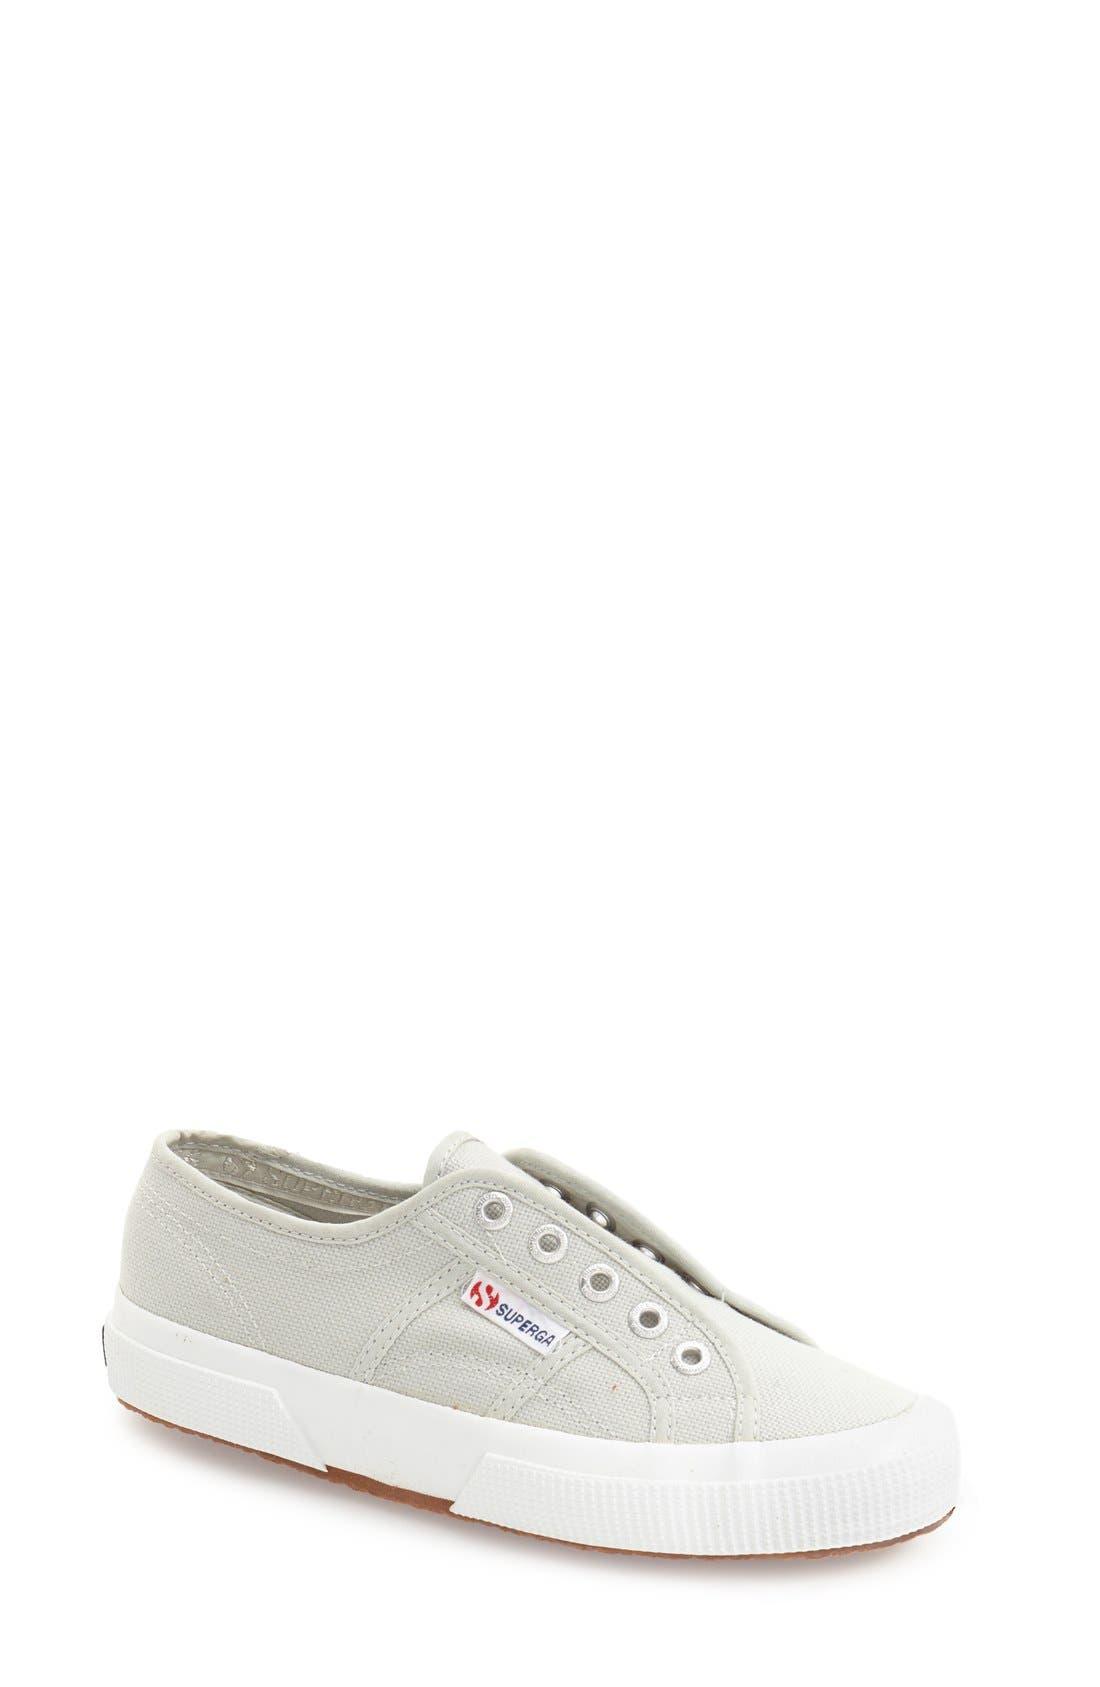 Main Image - Superga 'Cotu' Slip-On Sneaker (Women)